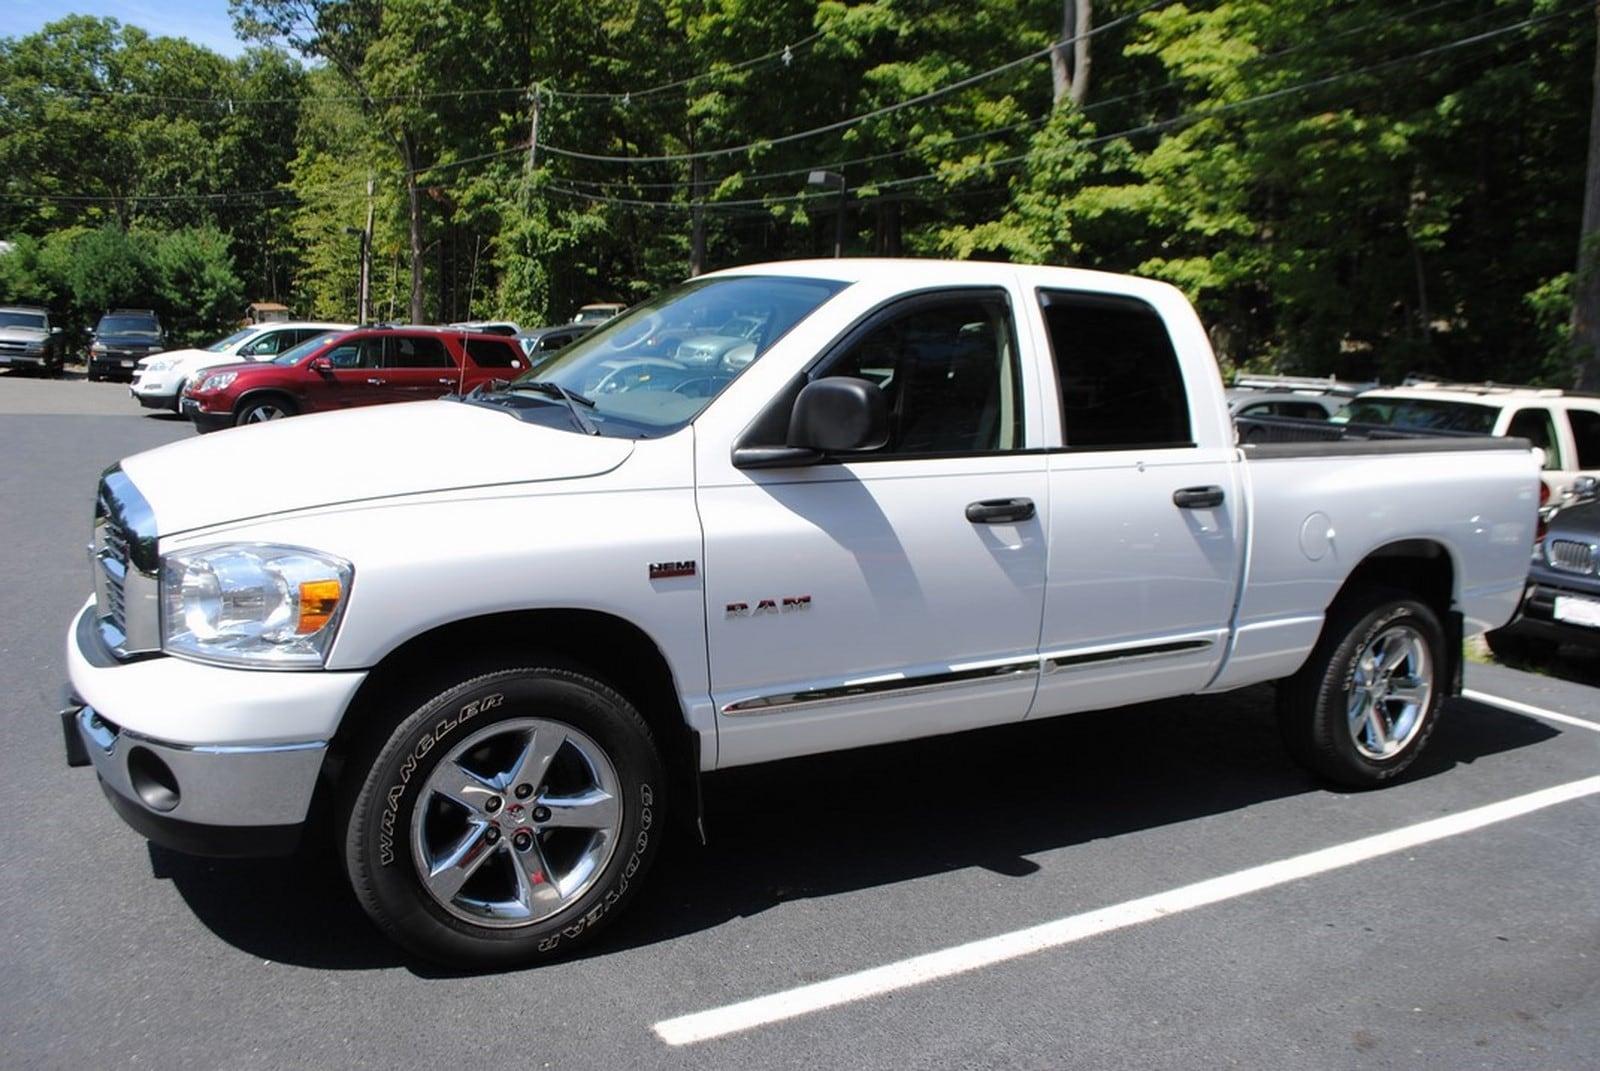 Used 2008 Dodge Ram 1500 For Sale West Milford Nj